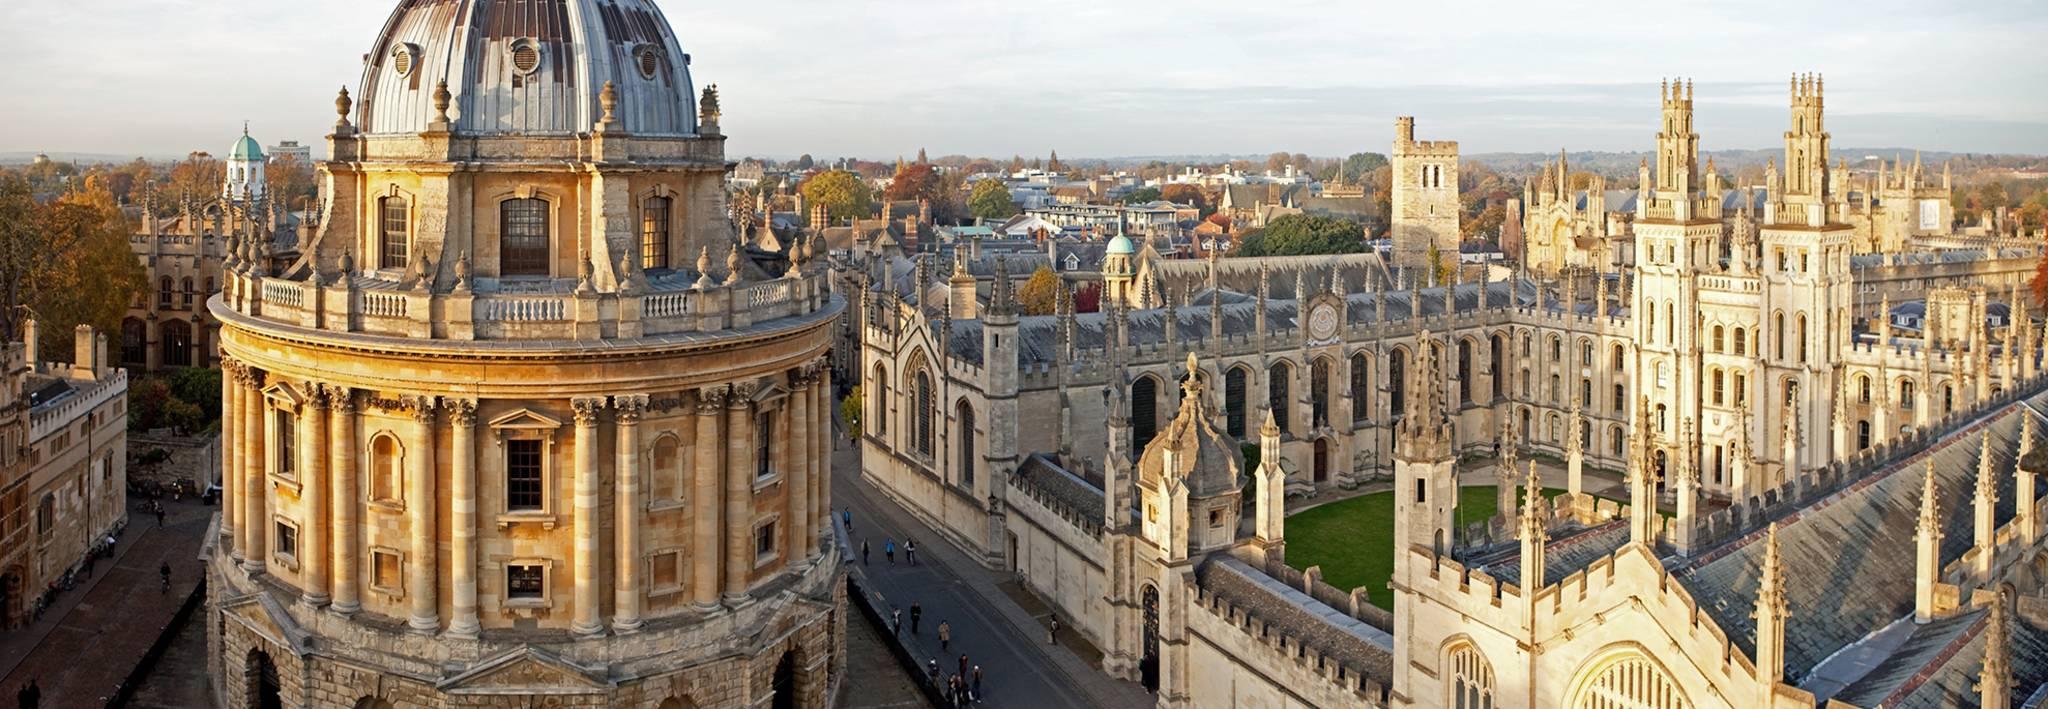 Oxford University's stunning campus.